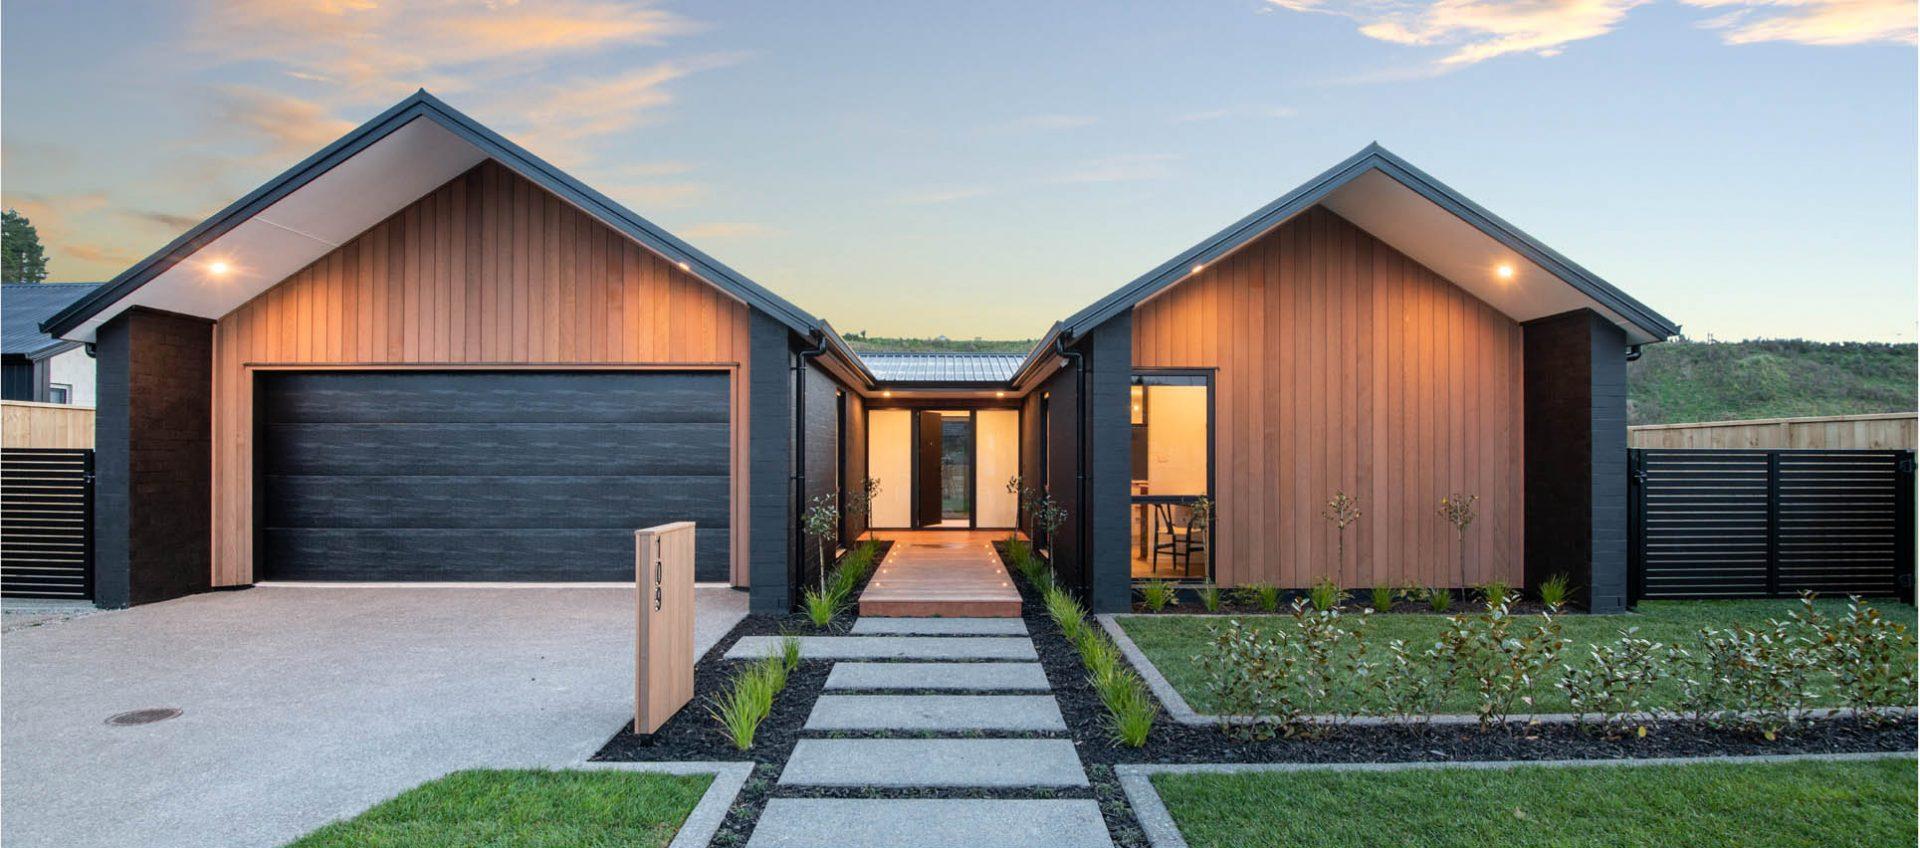 Proform Construction and Proform Homes